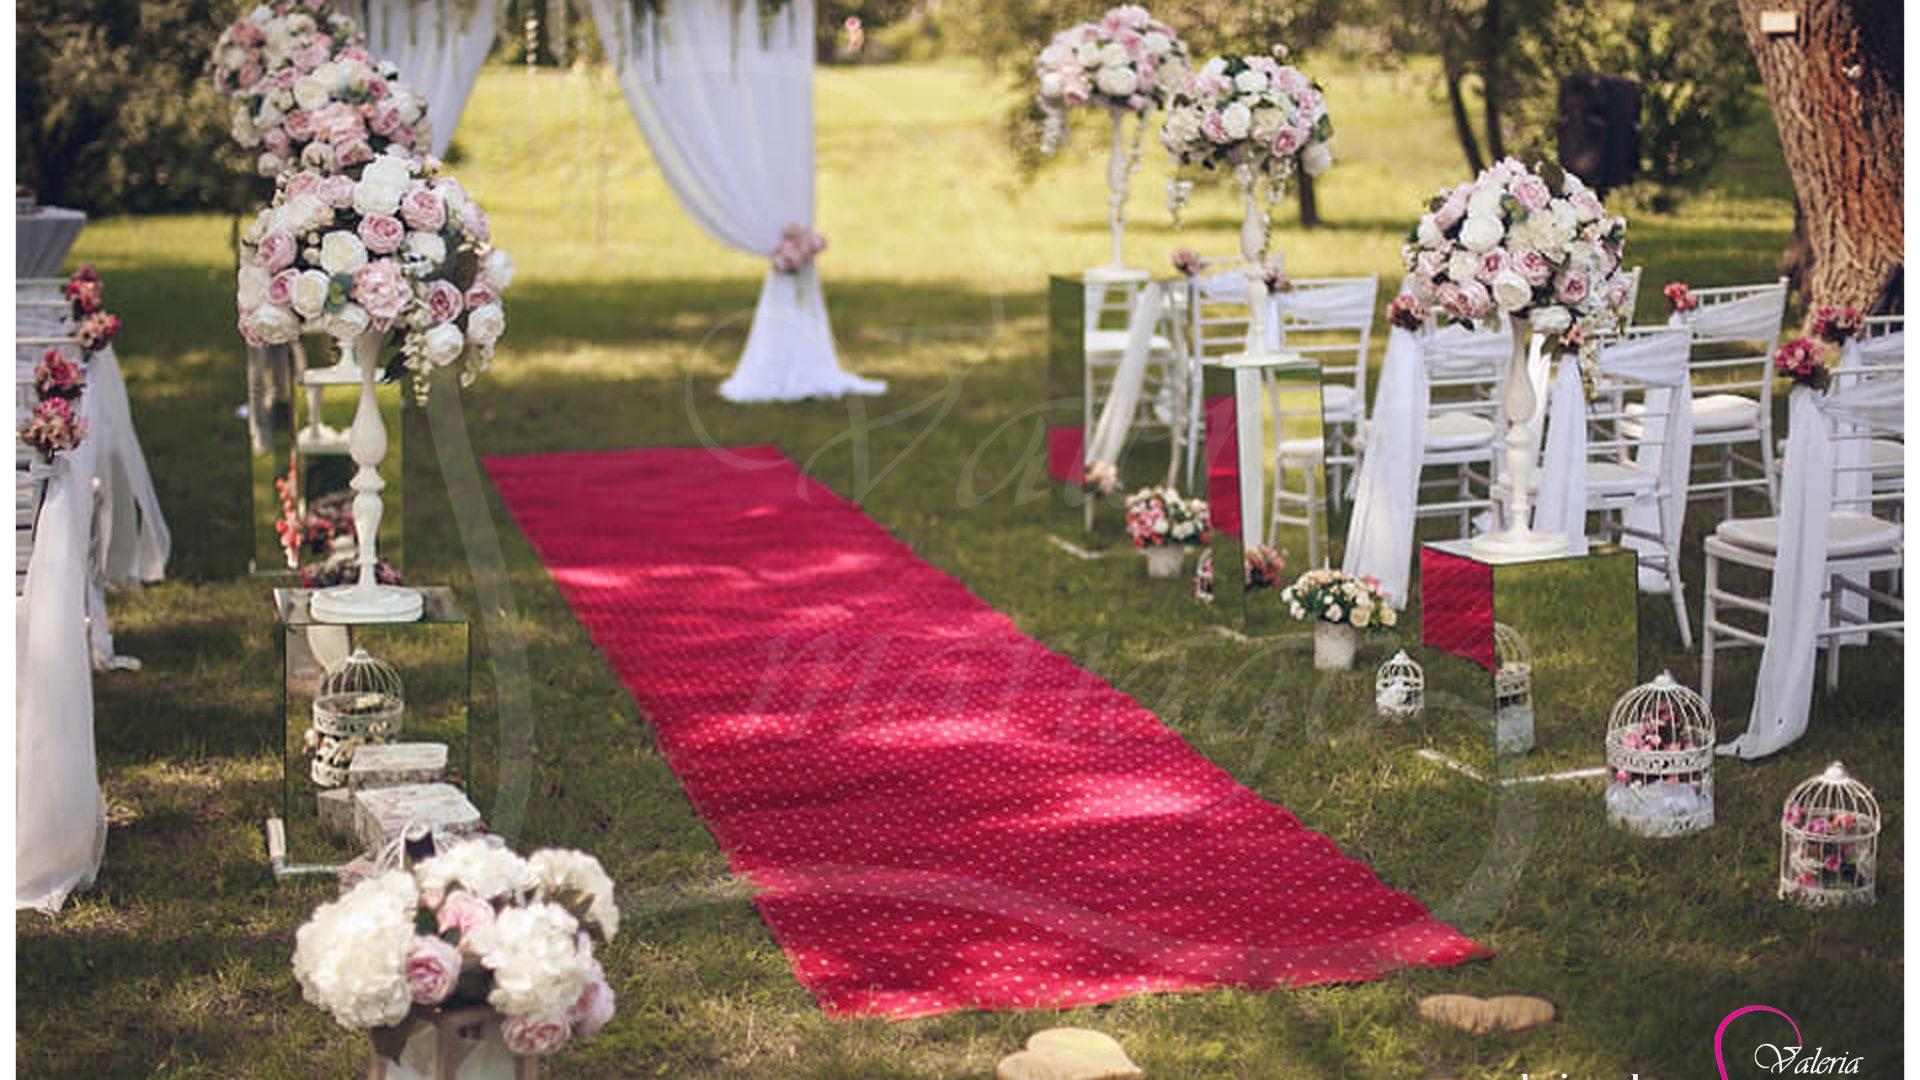 Inregistrarea casatoriei sub cerul liber Agentia Valeria Mariage 069787665 www.valeria (12)